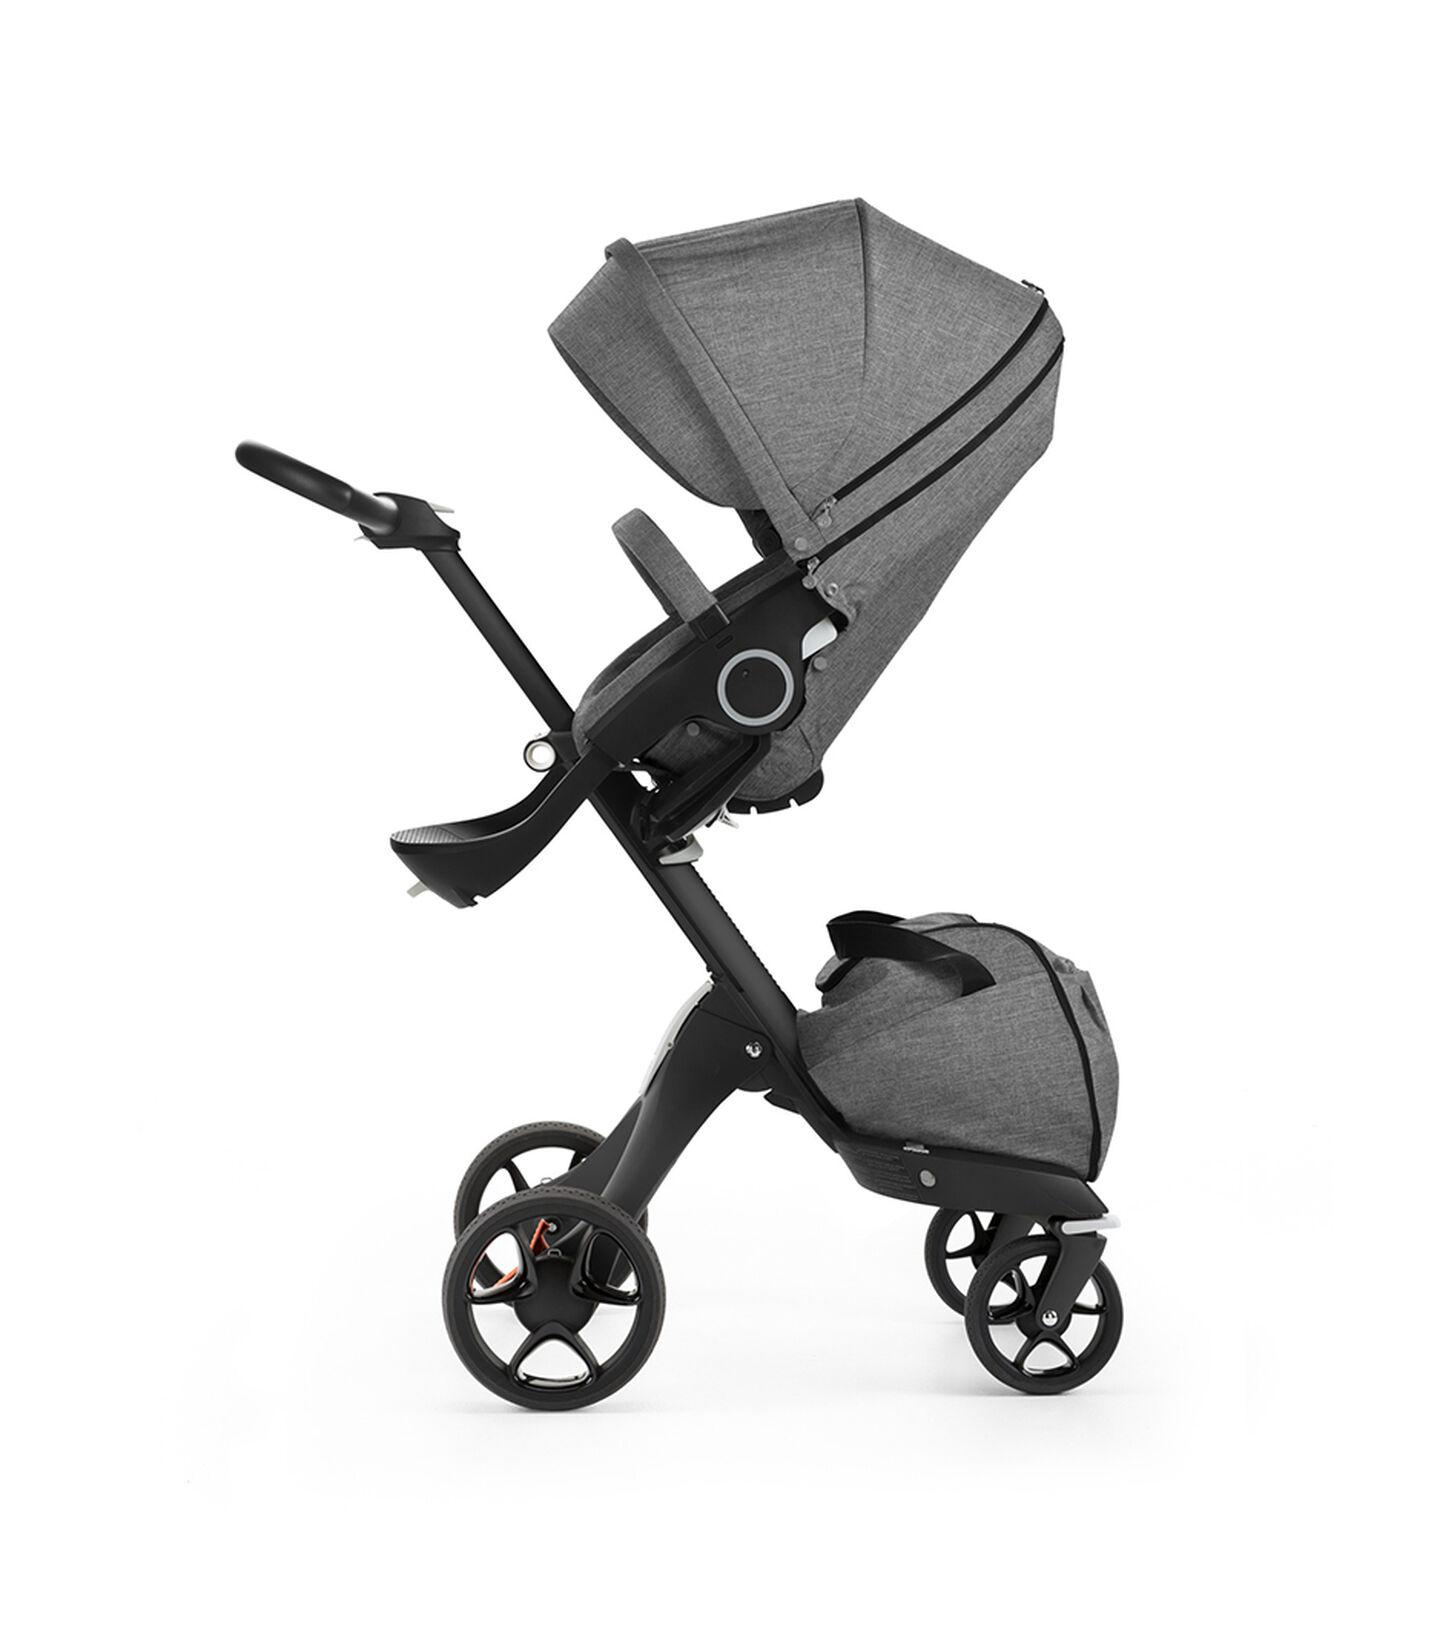 Stokke® Xplory® with Black chassis and Stokke® Stroller Seat, Black Melange. New wheels 2016.